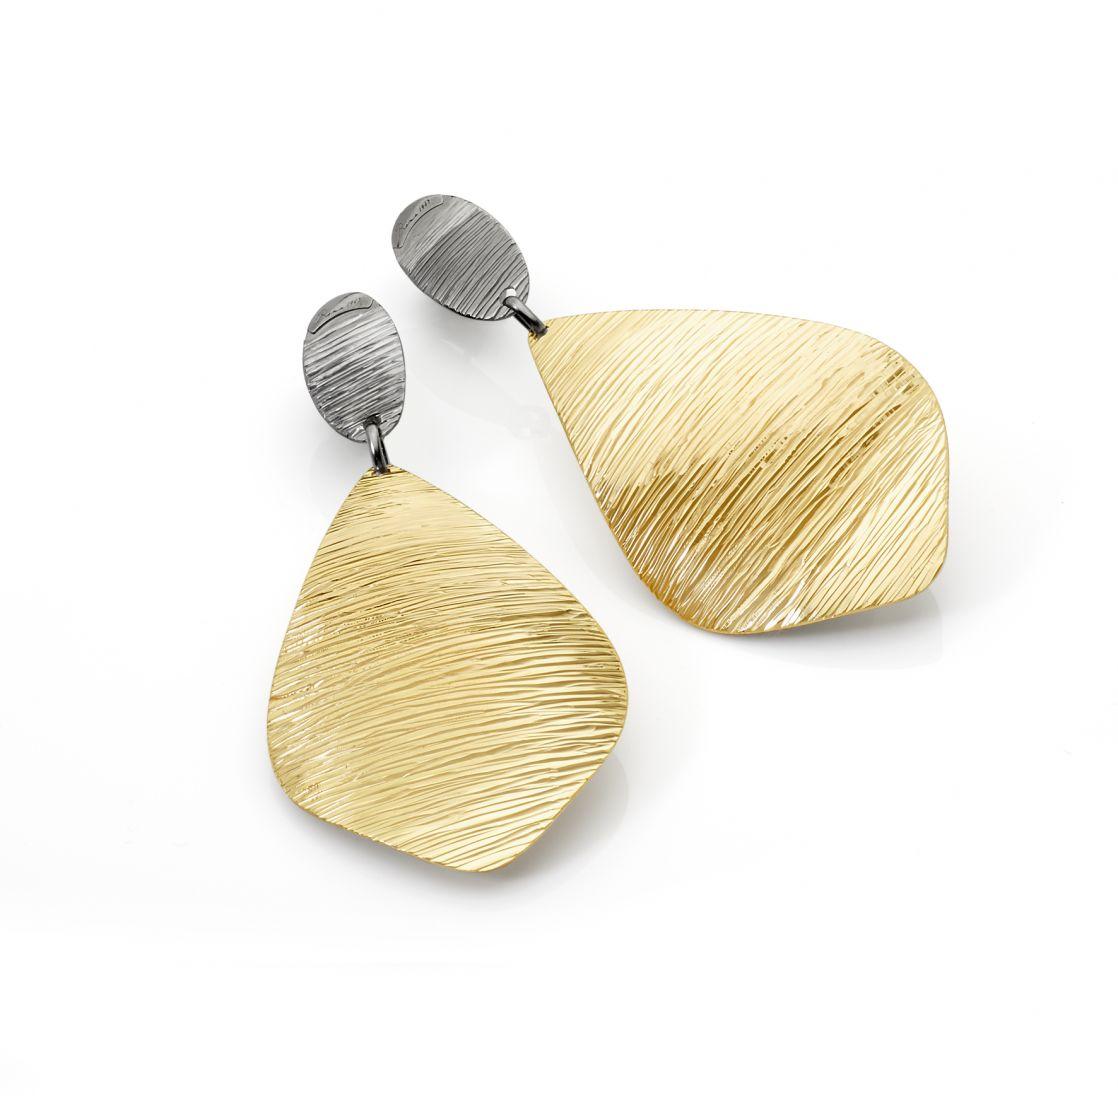 DIAMOND CUT DROP-SHAPED EARRINGS